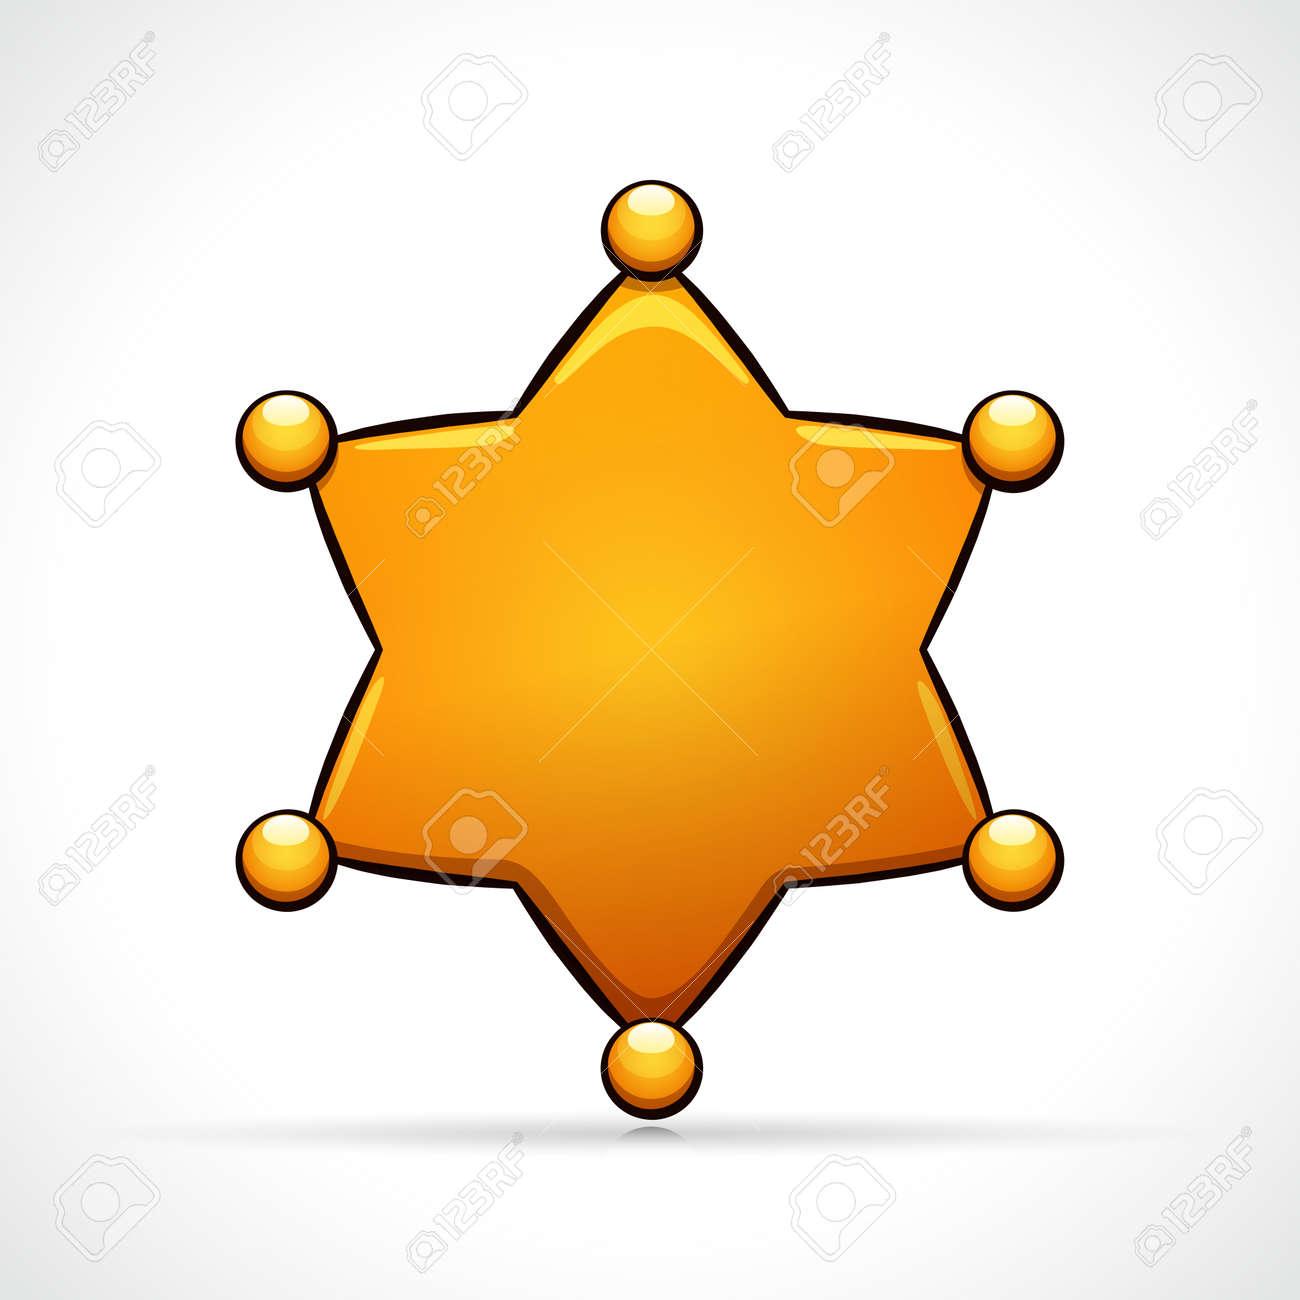 Vector illustration of star symbol icon design - 141469637